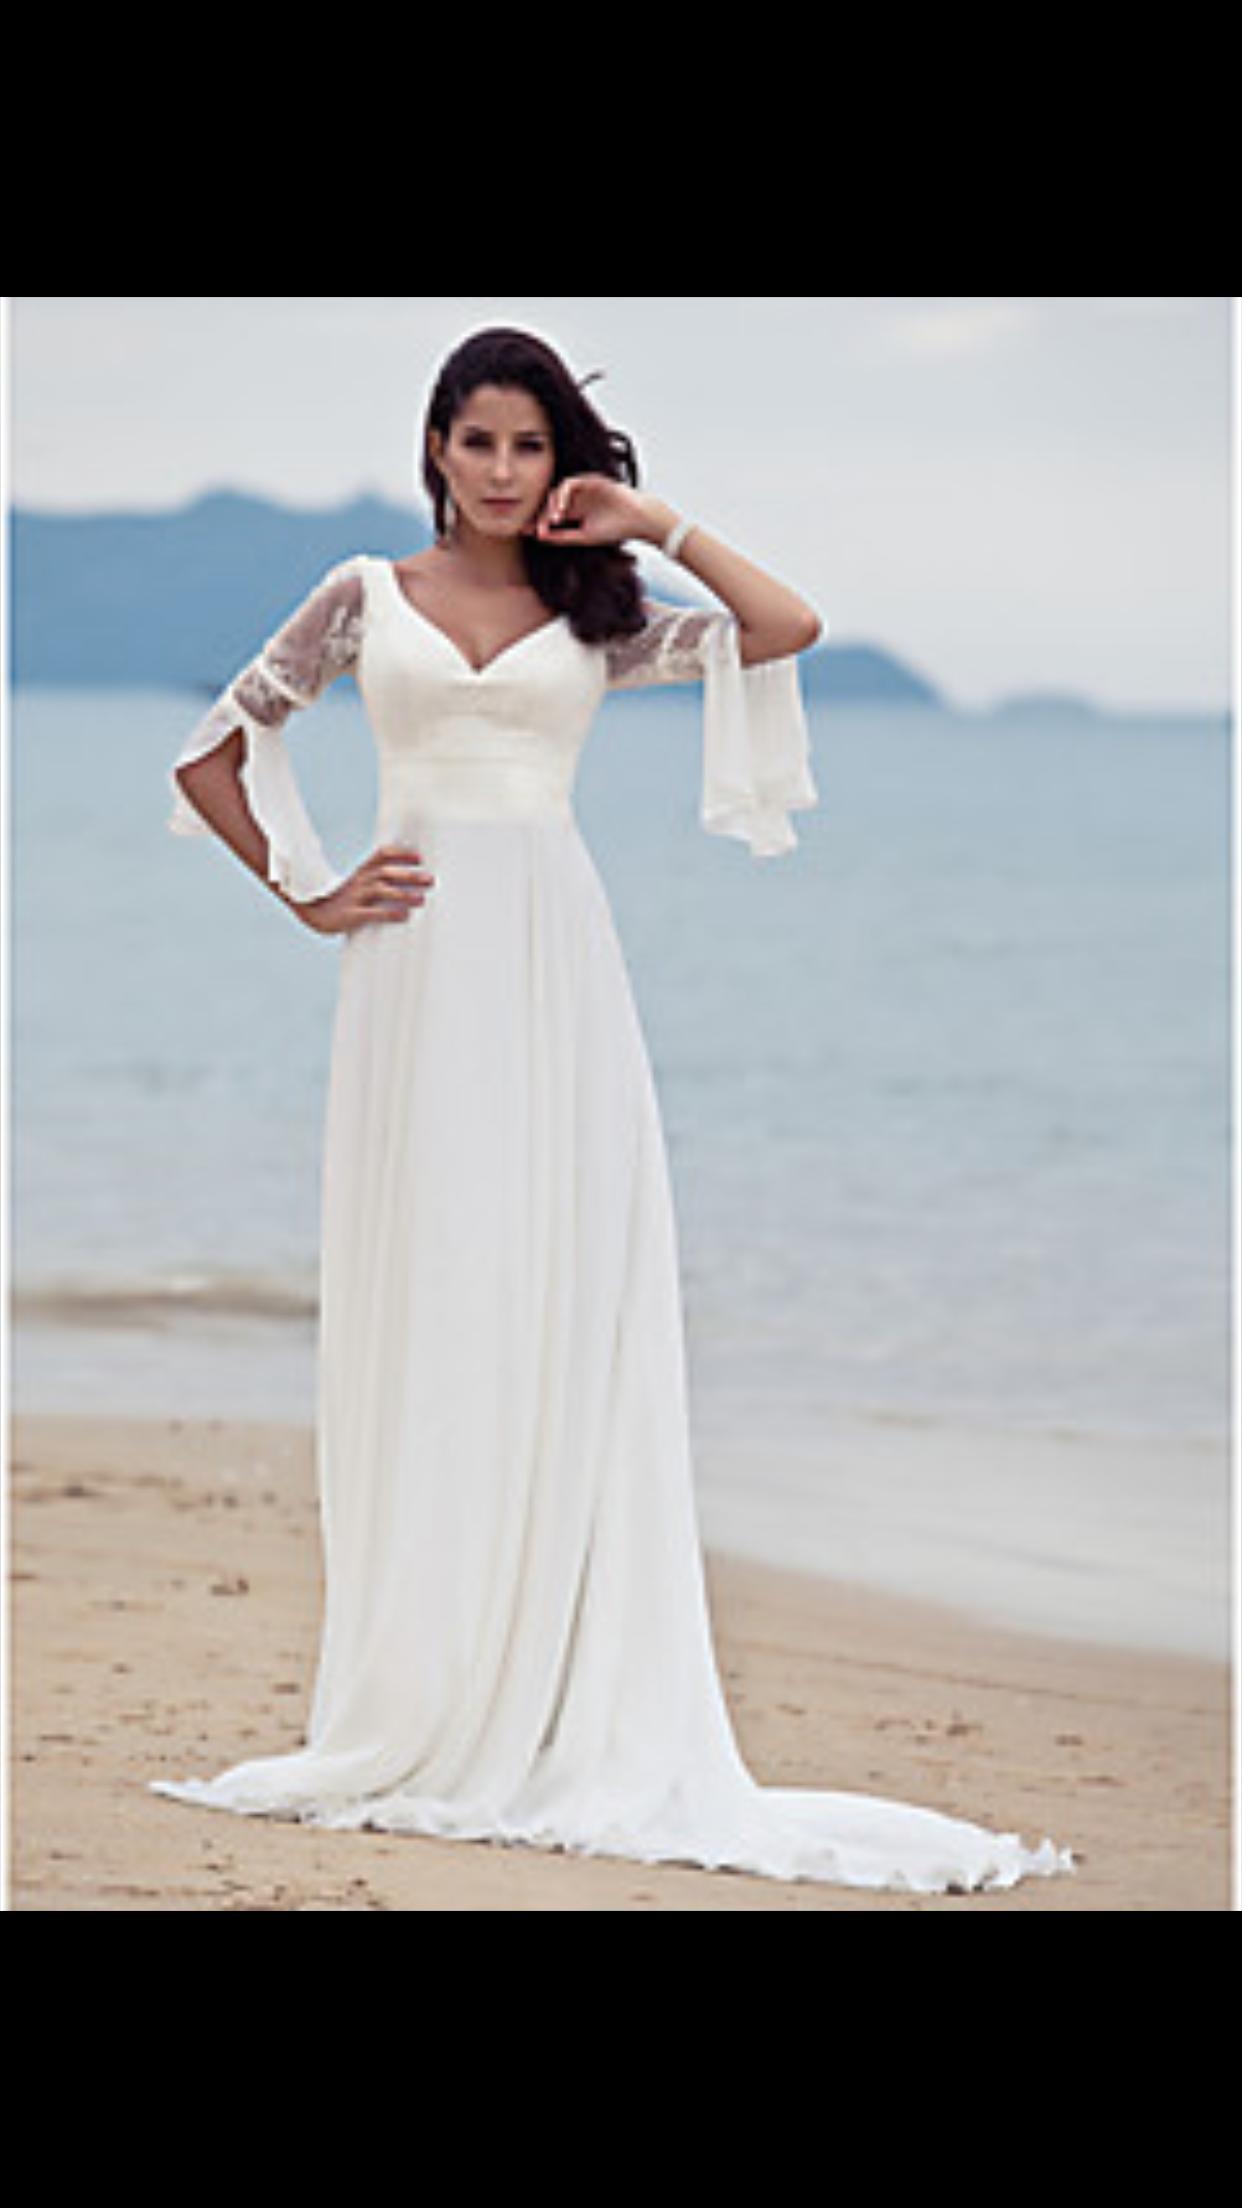 Cheap boho wedding dresses  Pin by joy beyda on Fashionation  Pinterest